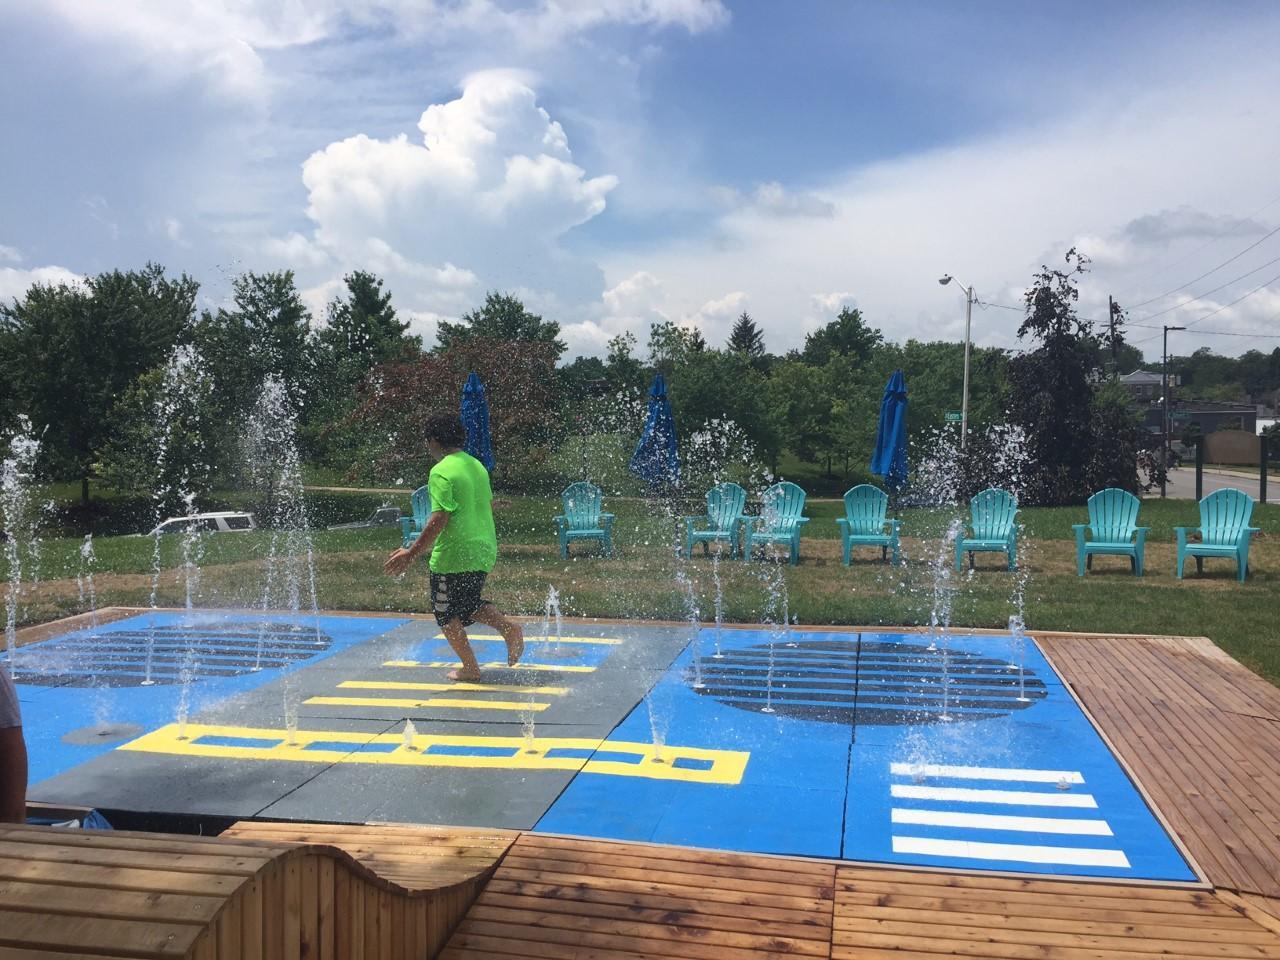 New Splash Pad Installed In Thoroughbred Park